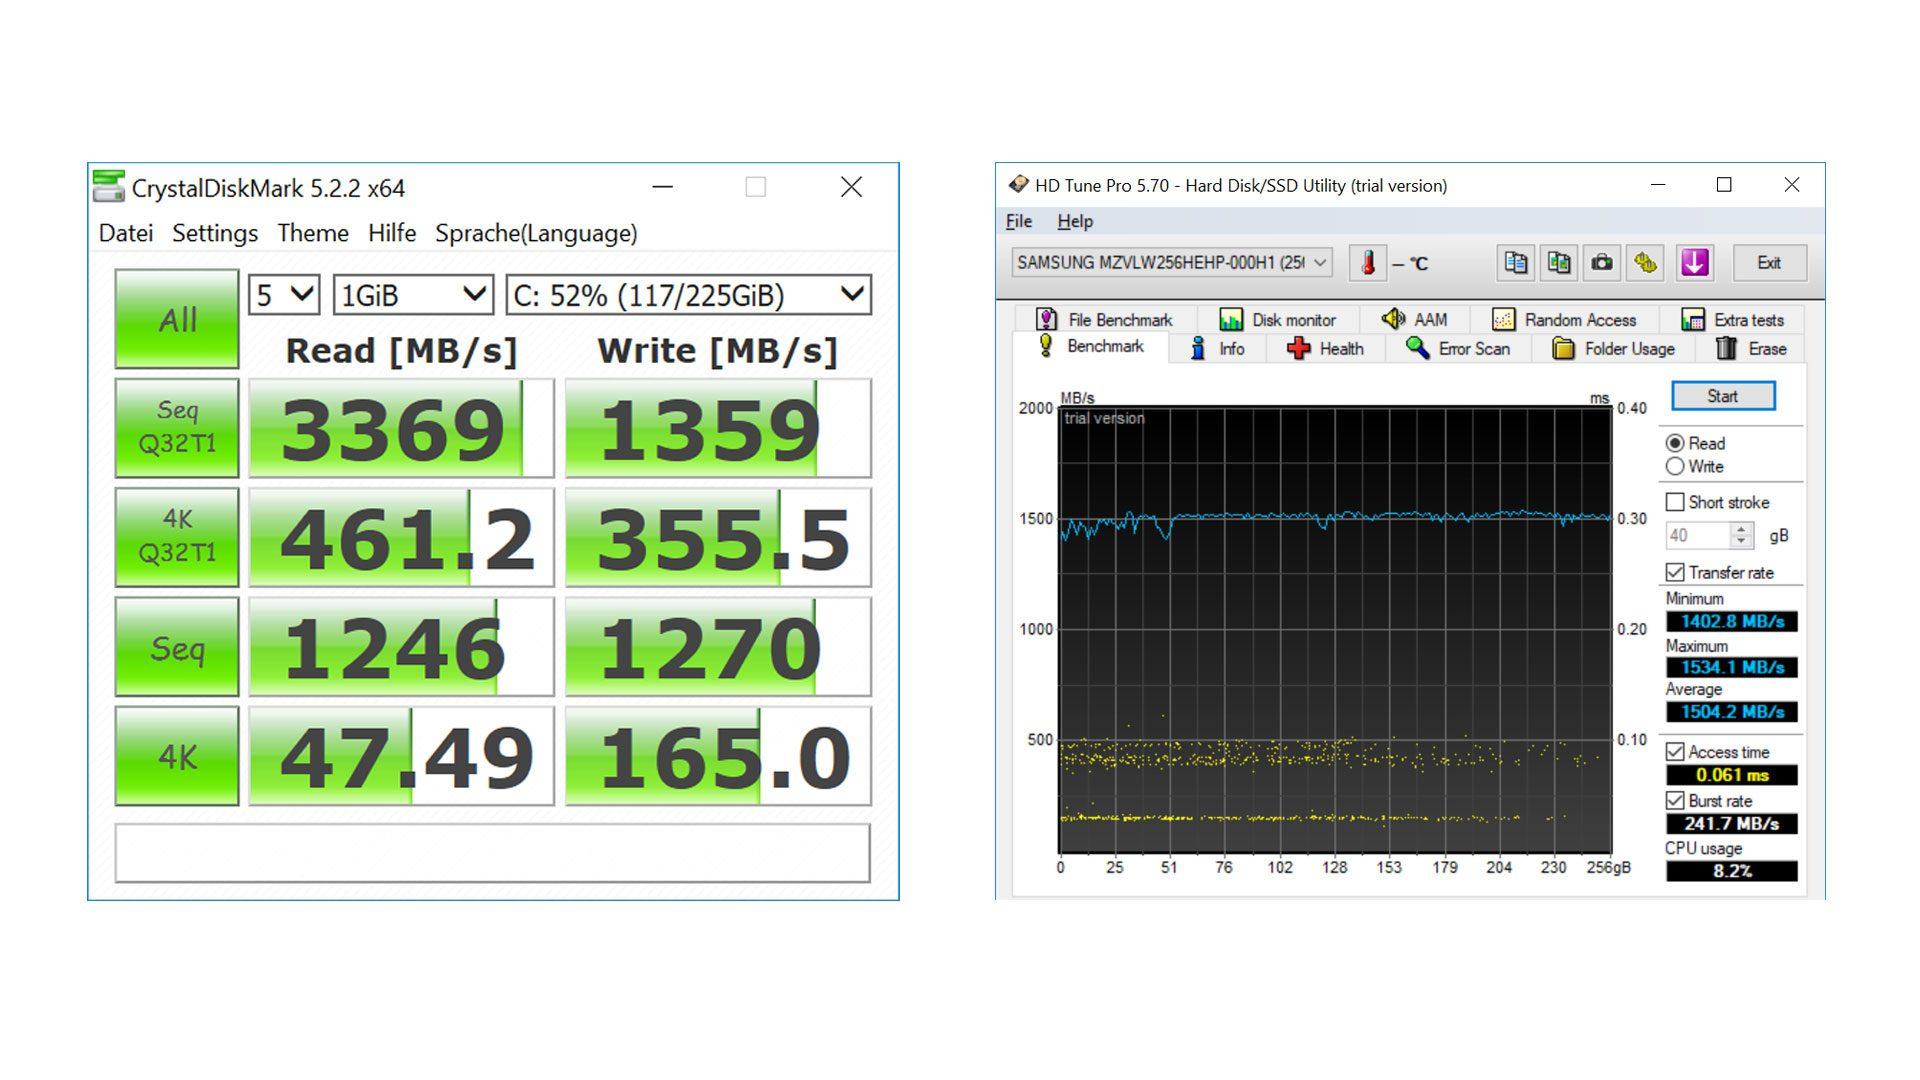 HP-Spectre-x360-13-ac000ng_Benchmark-6